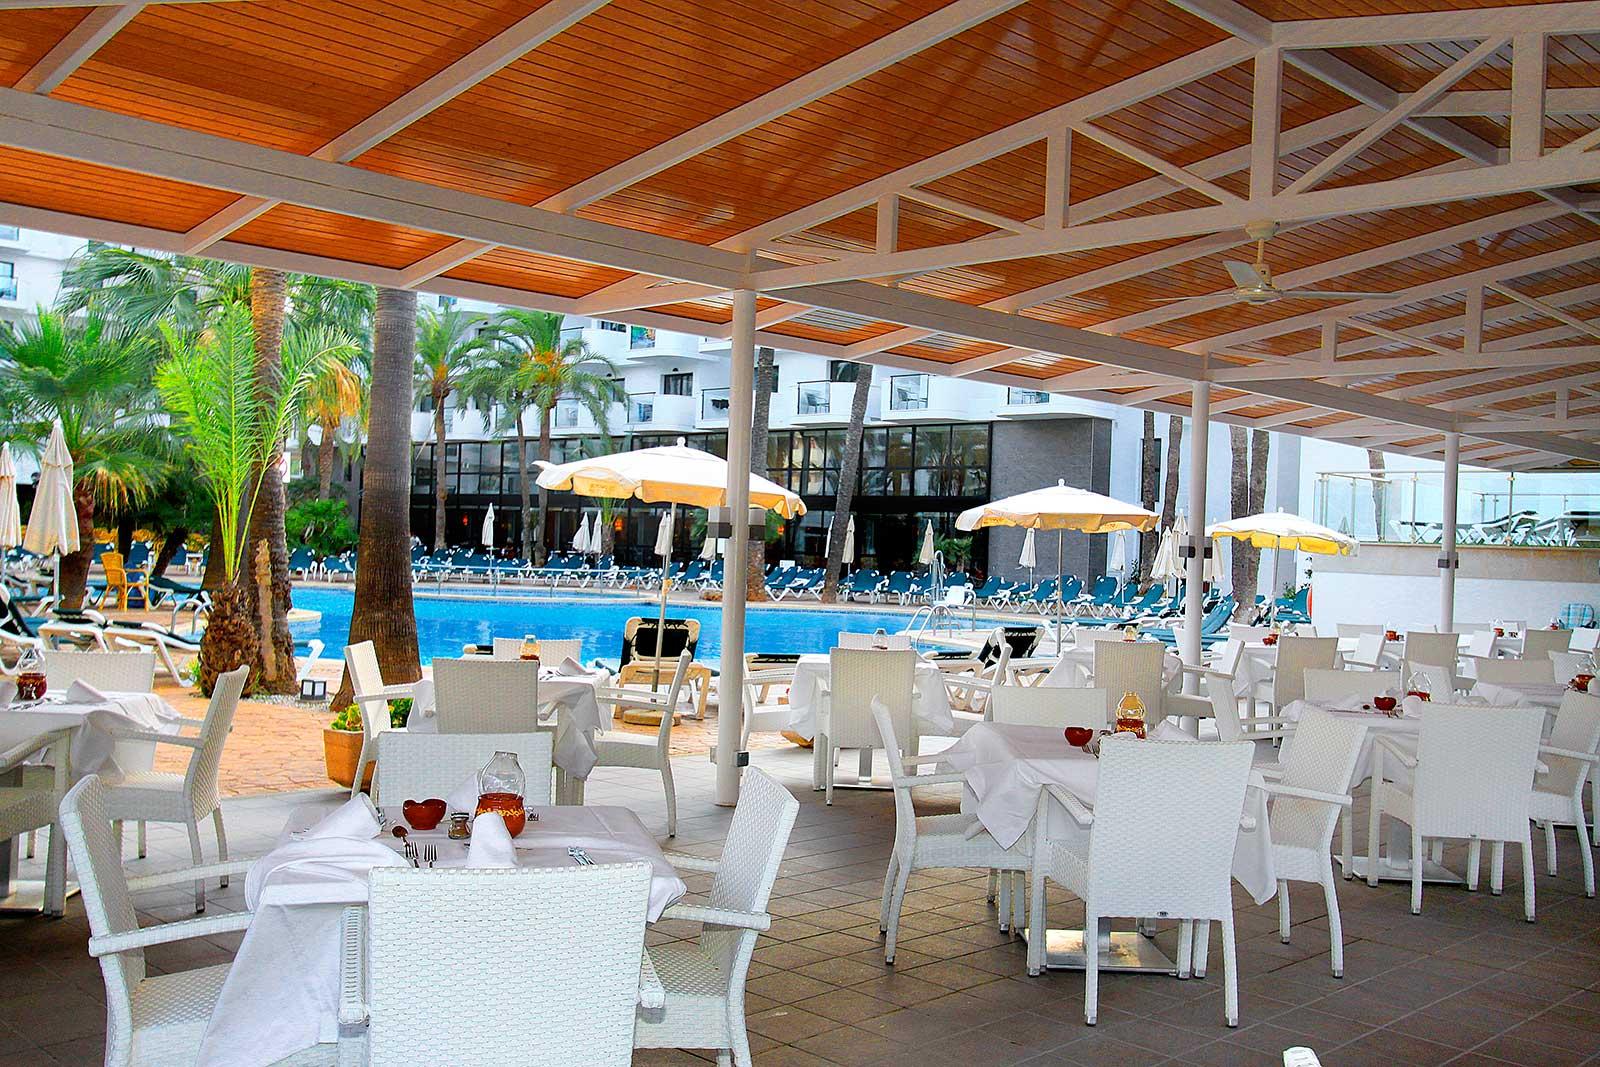 Gastronomy protur palmeras playa hotel sa coma majorca - Piscina playa ...